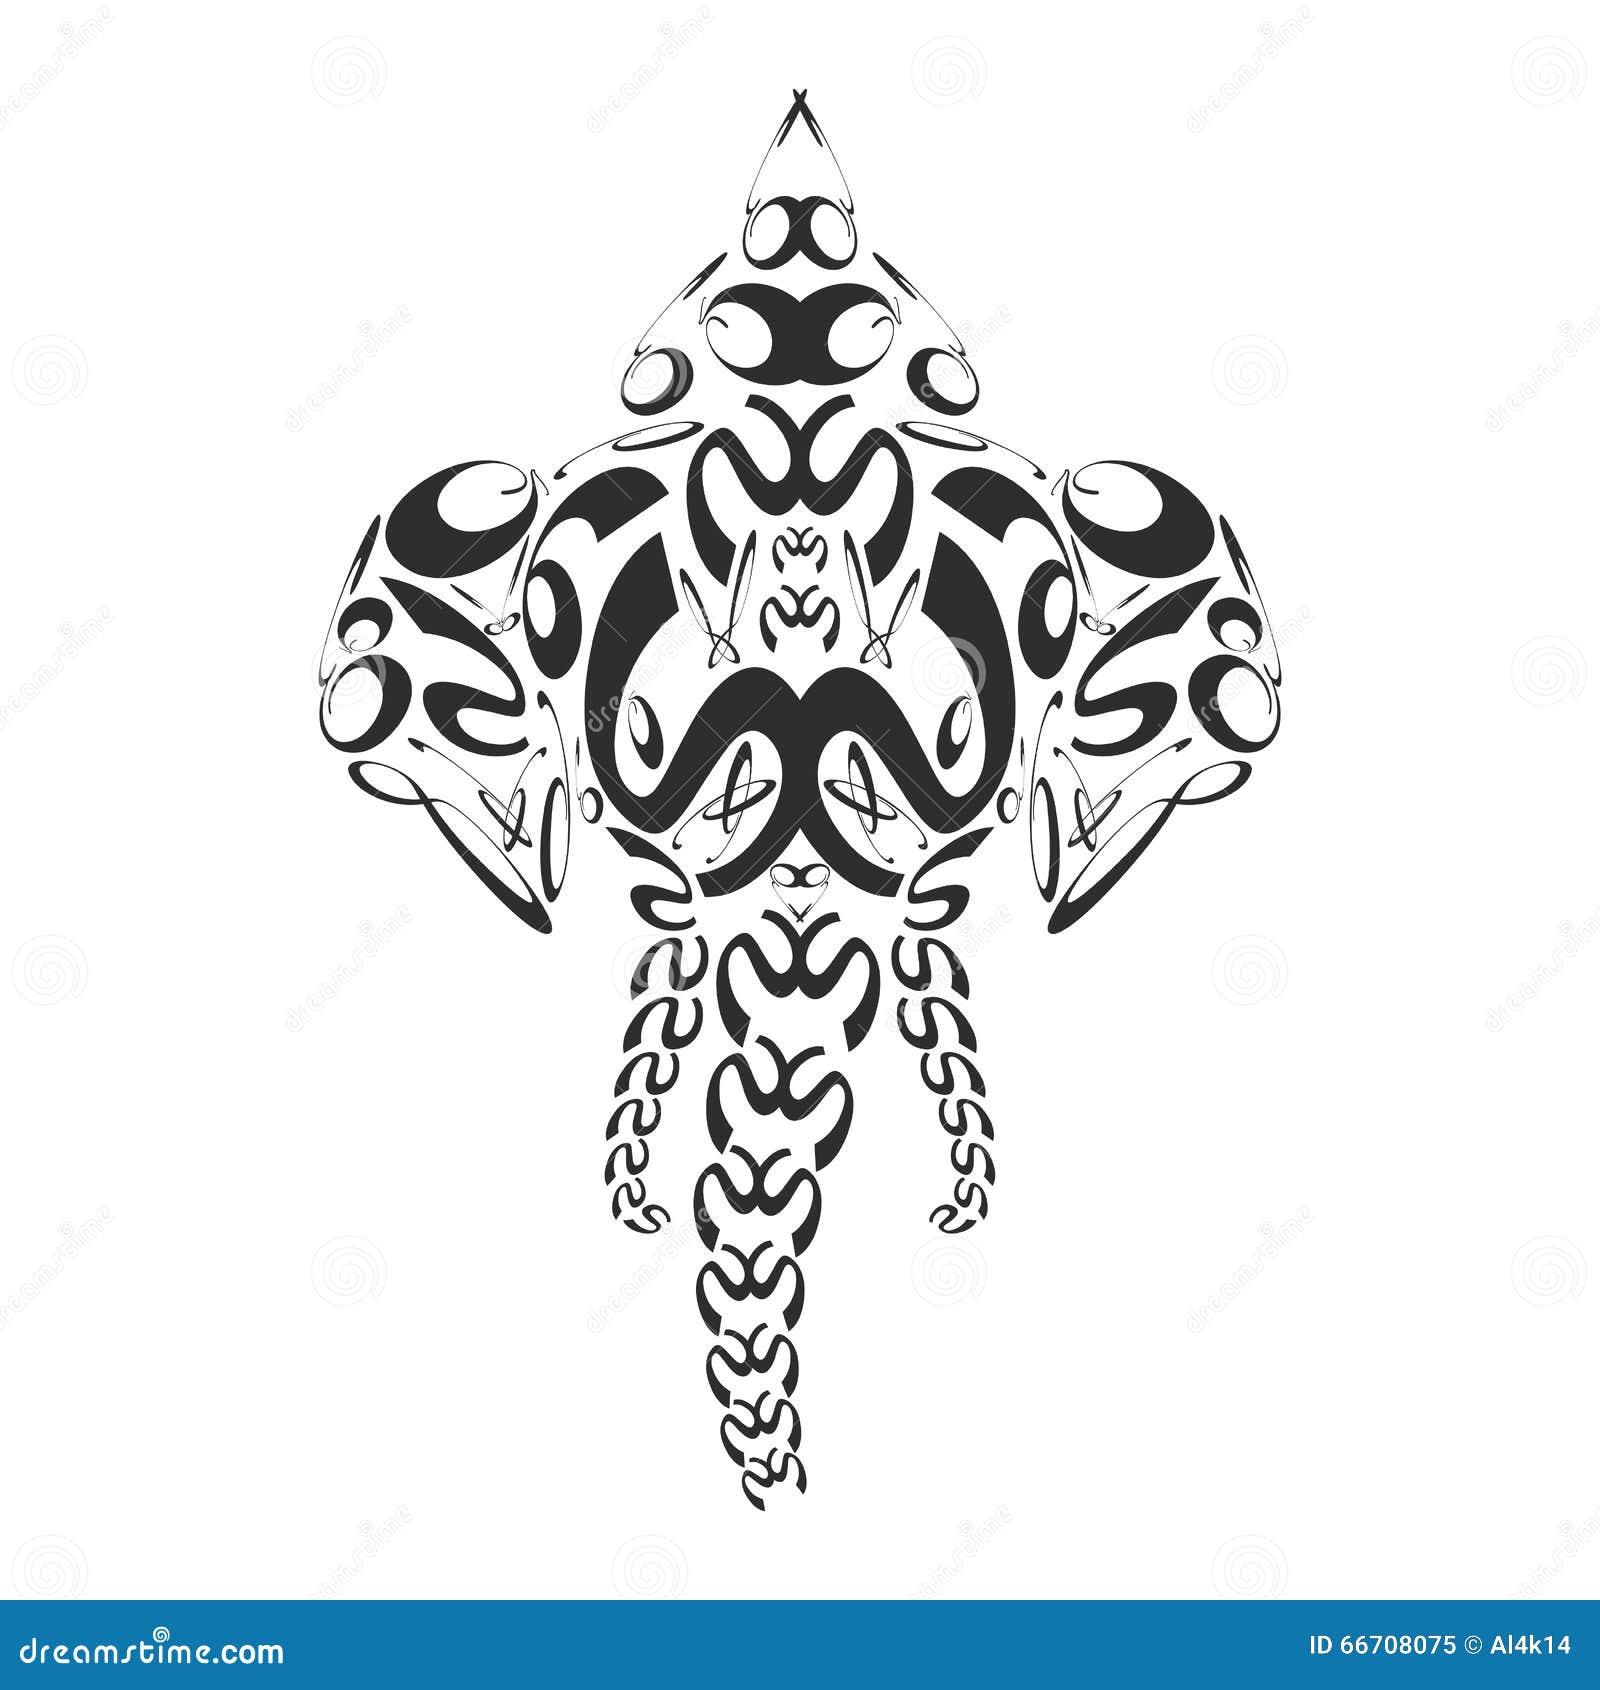 Vector Abstract Monochrome Elephant Ganesh Illustration